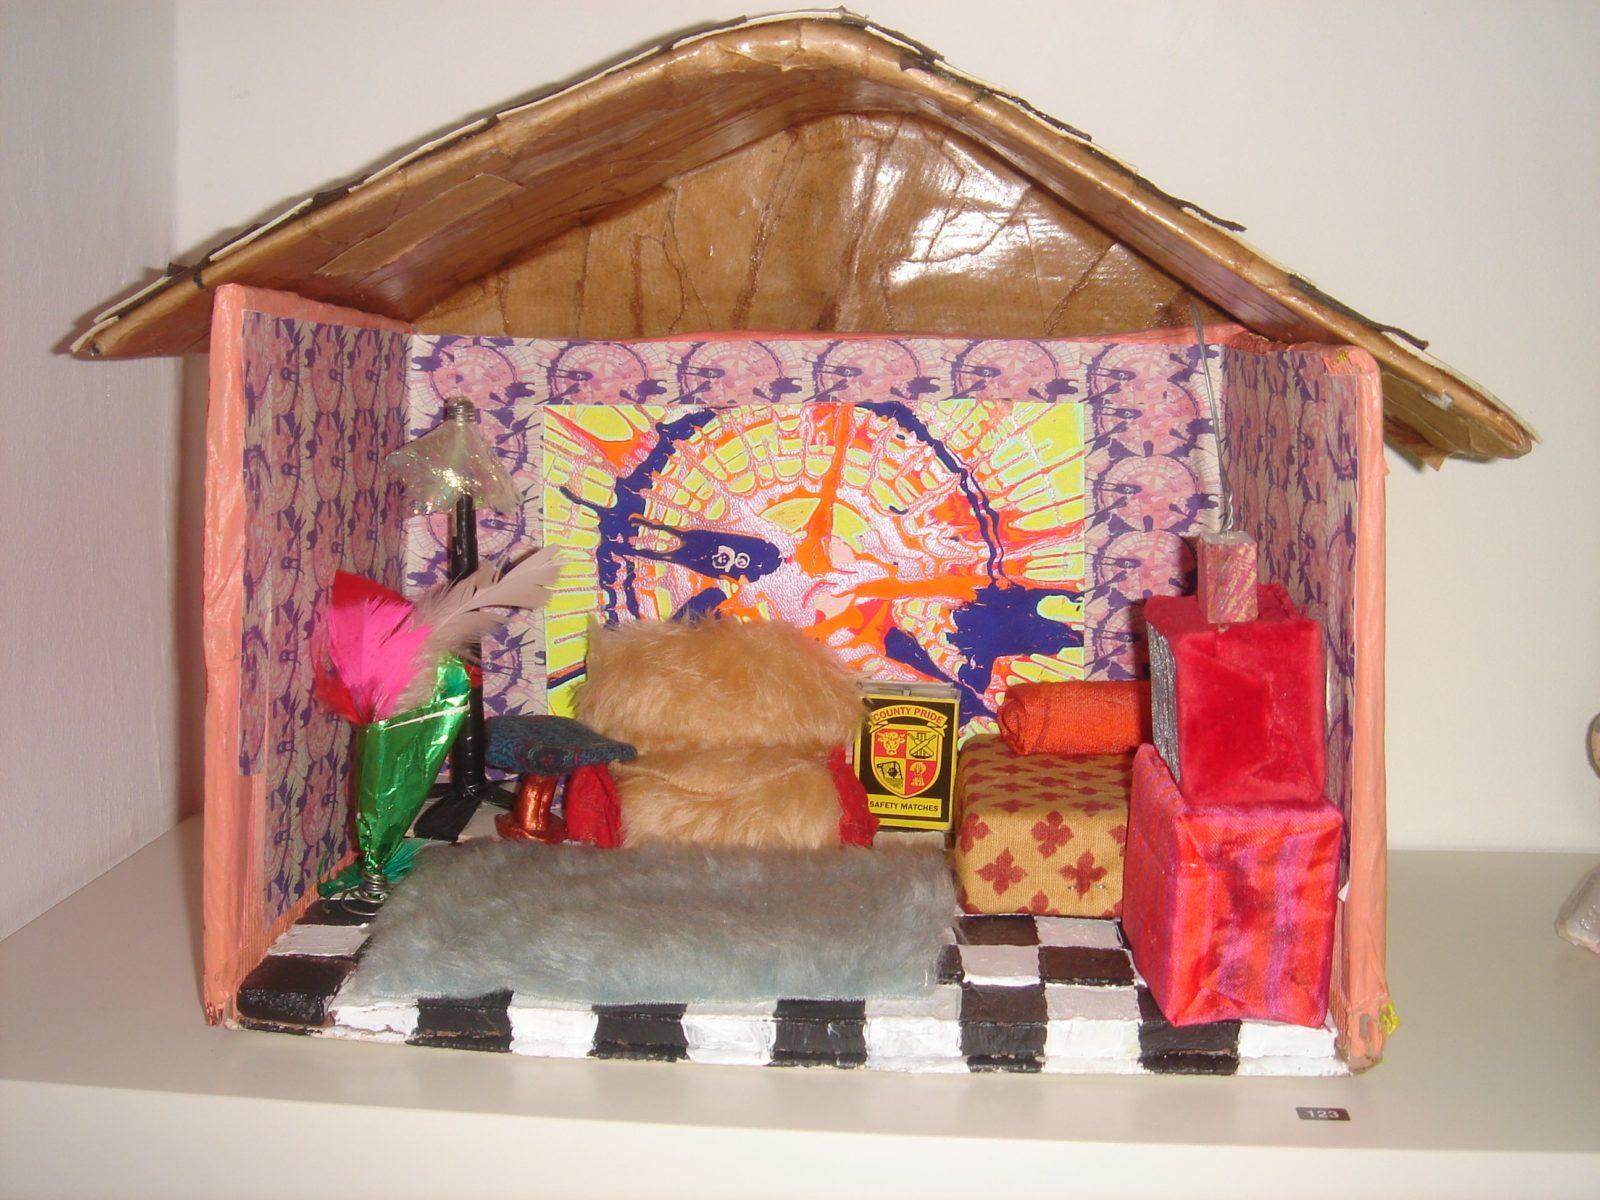 32438 || 3190 || Dolls House